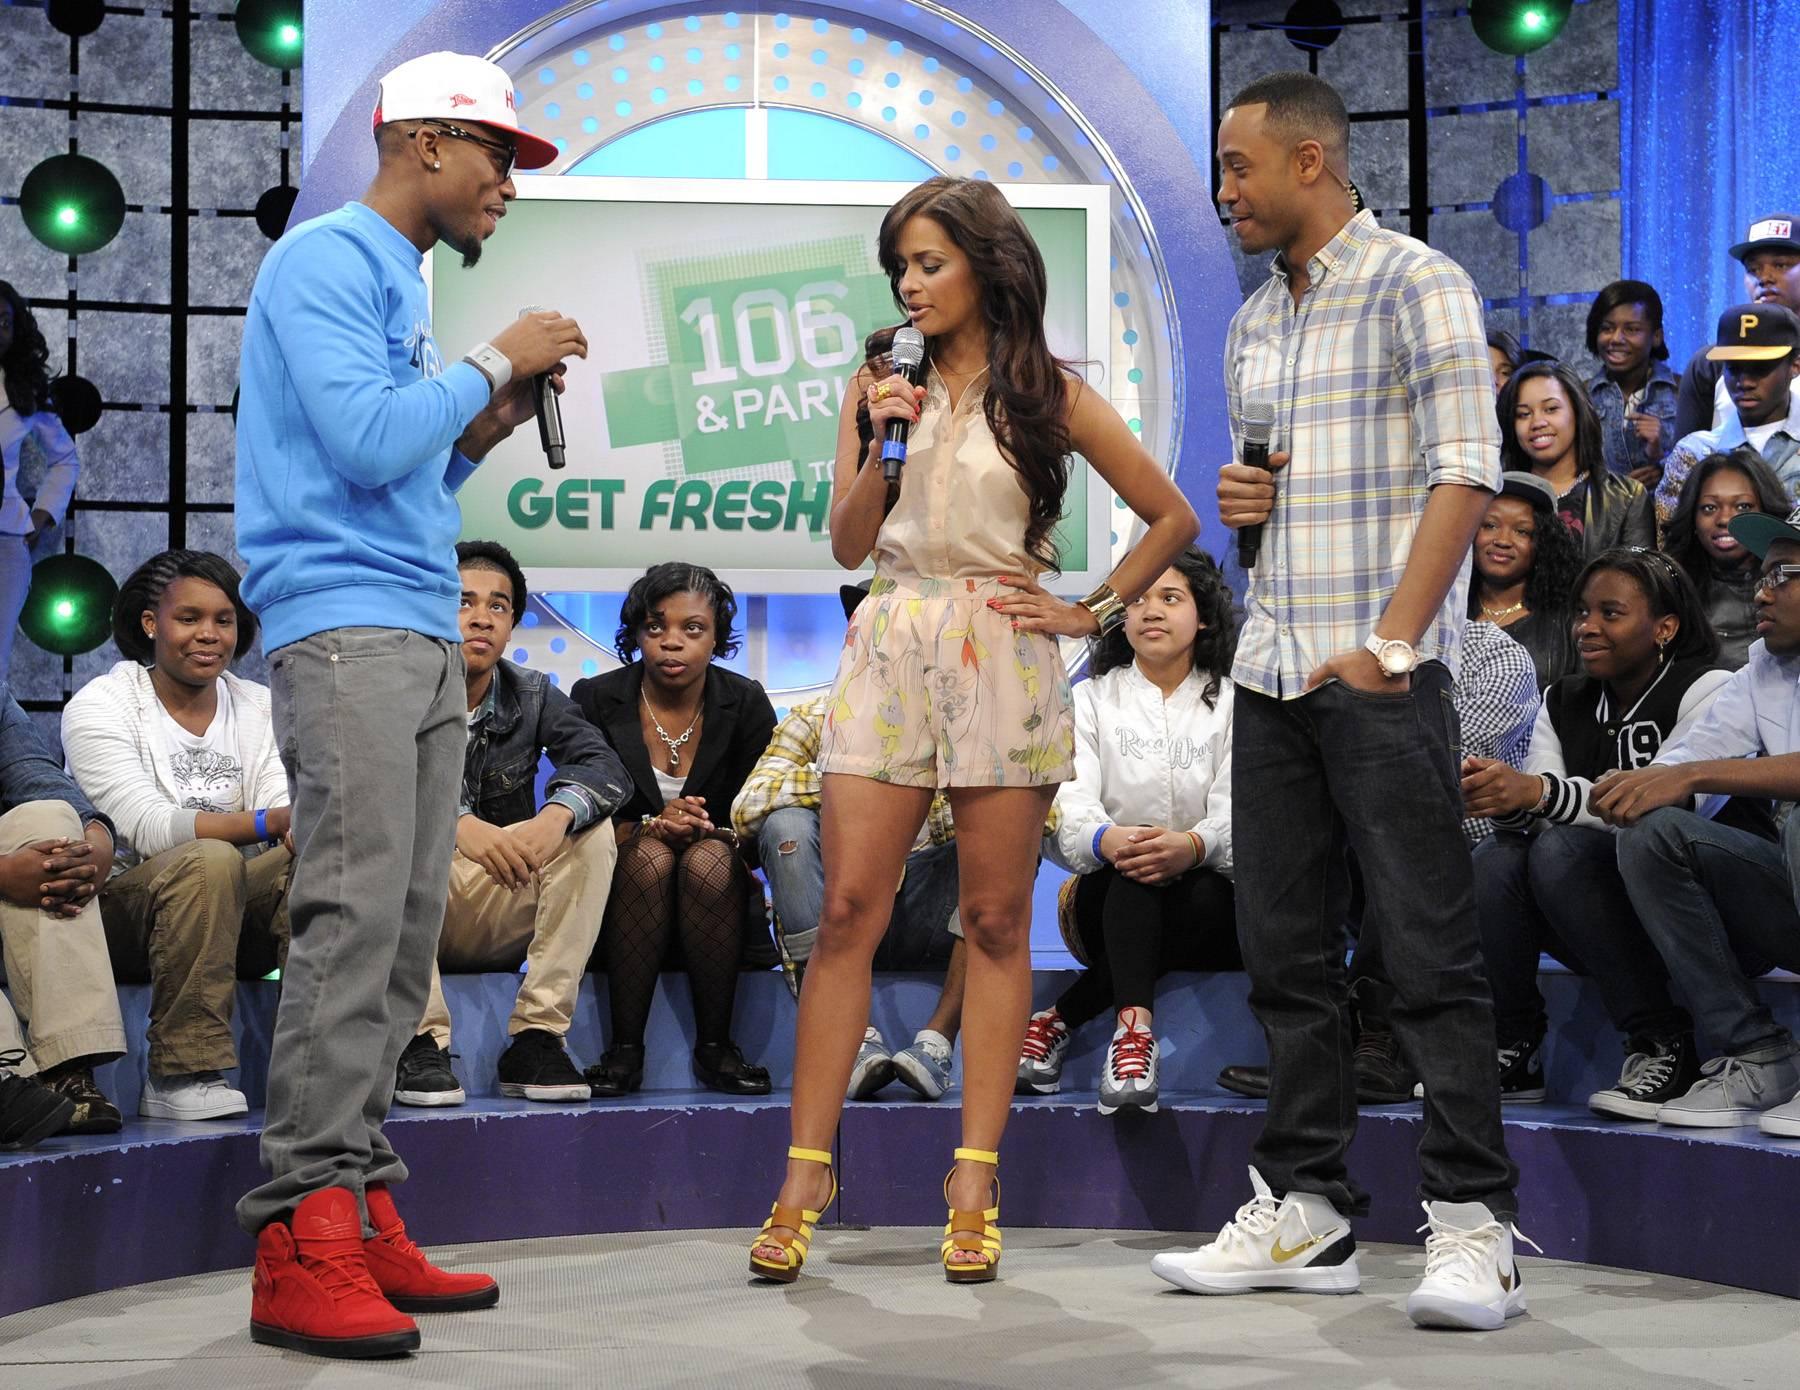 I Like Those - B.o.B with Rocsi Diaz and Terrence J at 106 & Park, May 1, 2012. (Photo: John Ricard / BET)